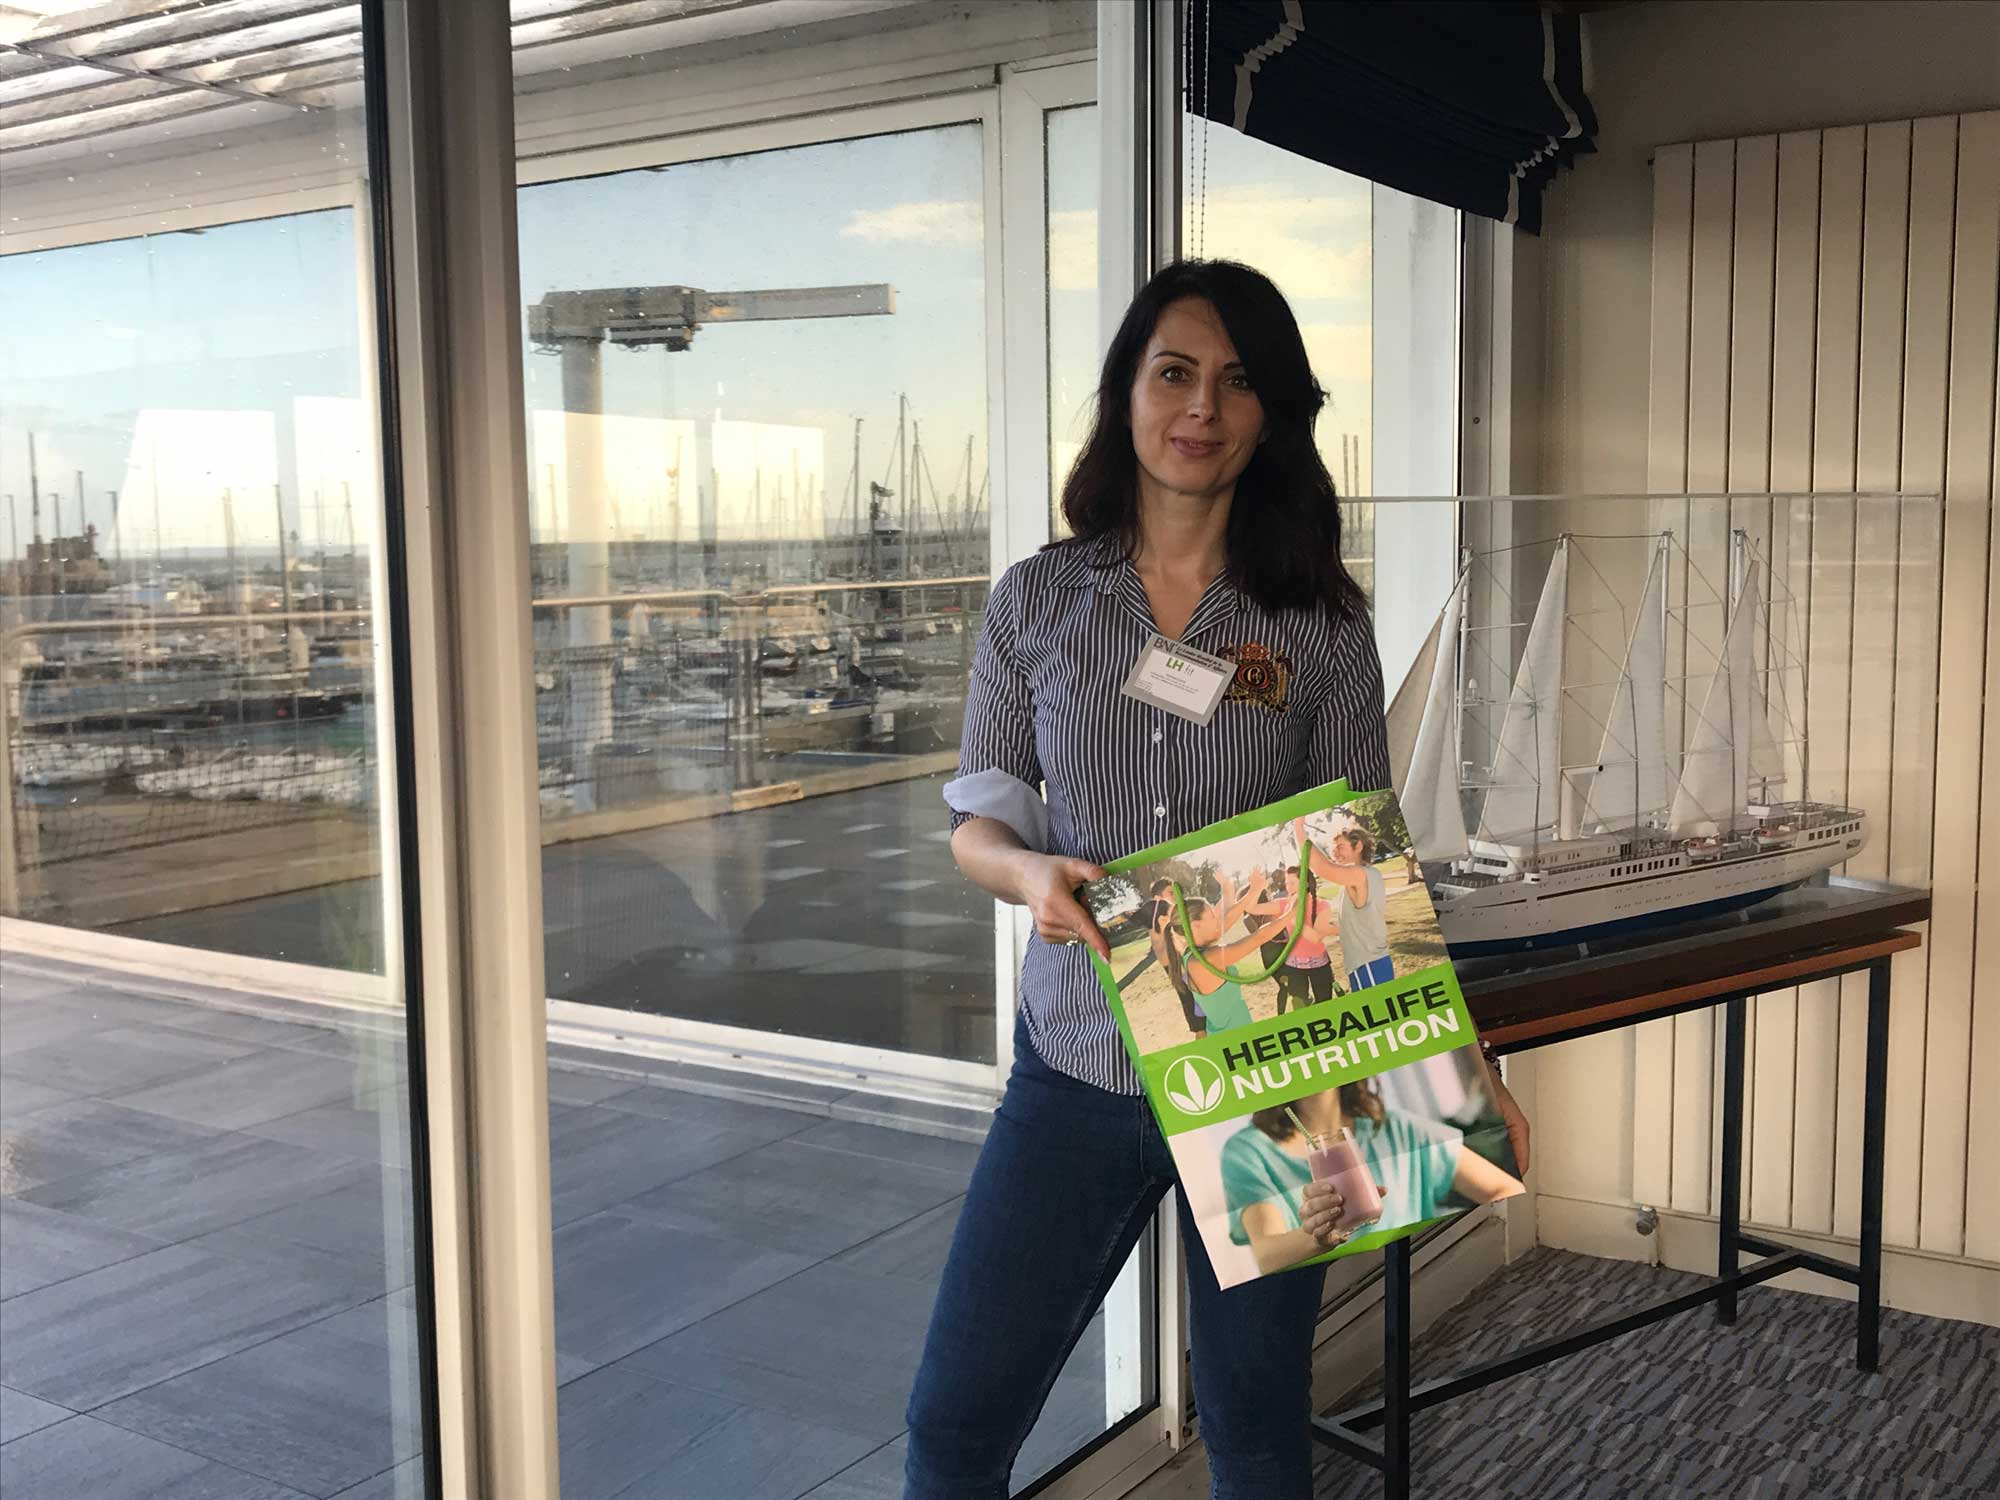 Vanessa-Lainé---Herbalife-Normandie